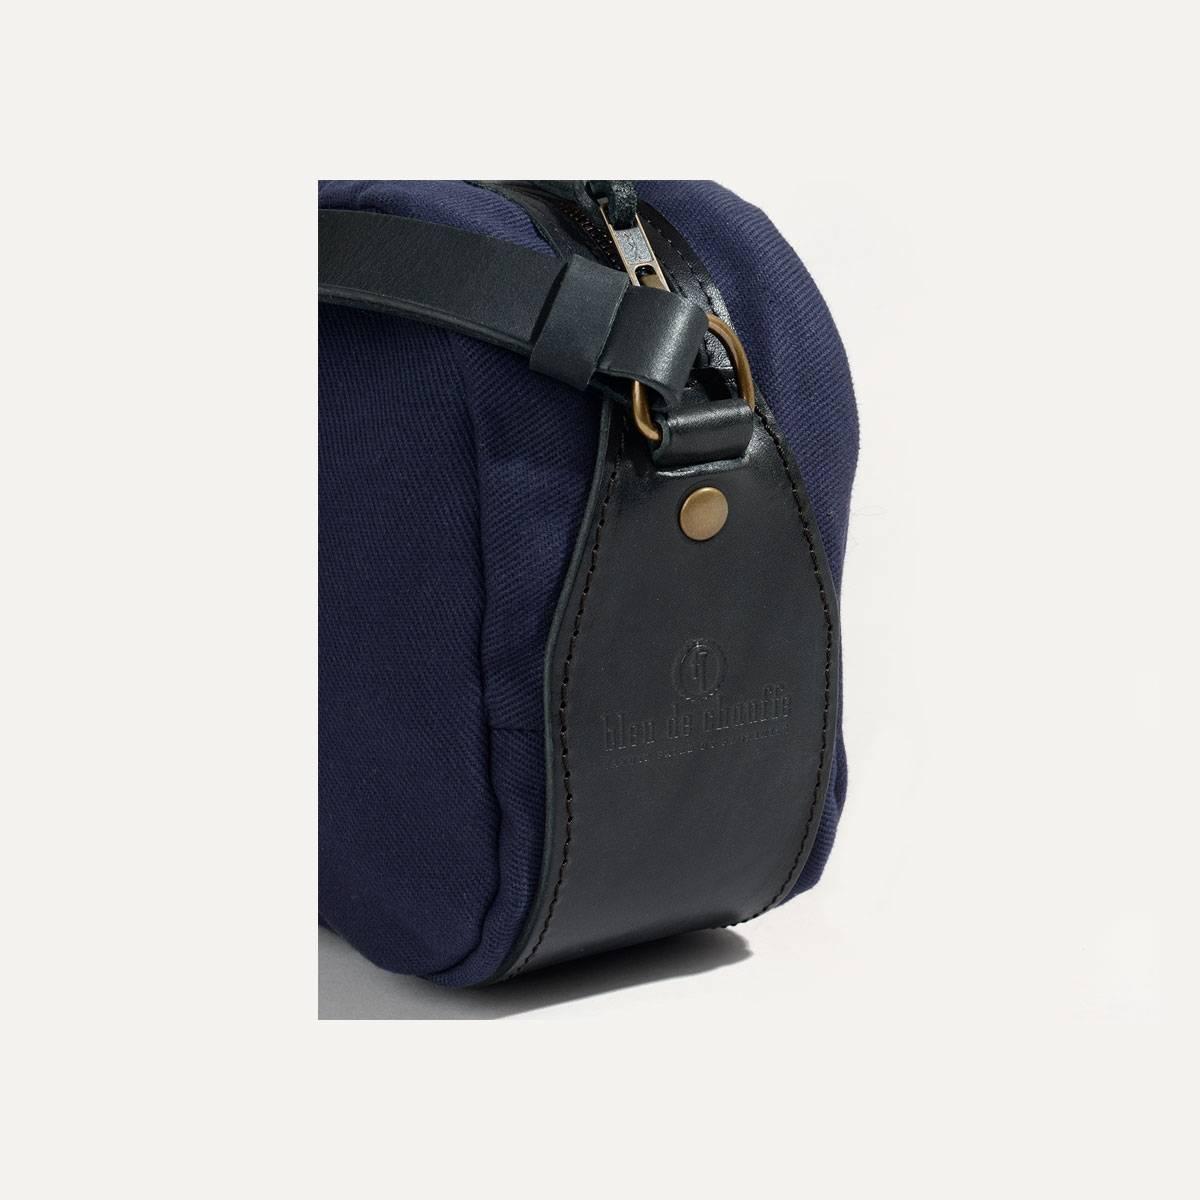 Honshu Belt bag - Navy / Black (image n°7)